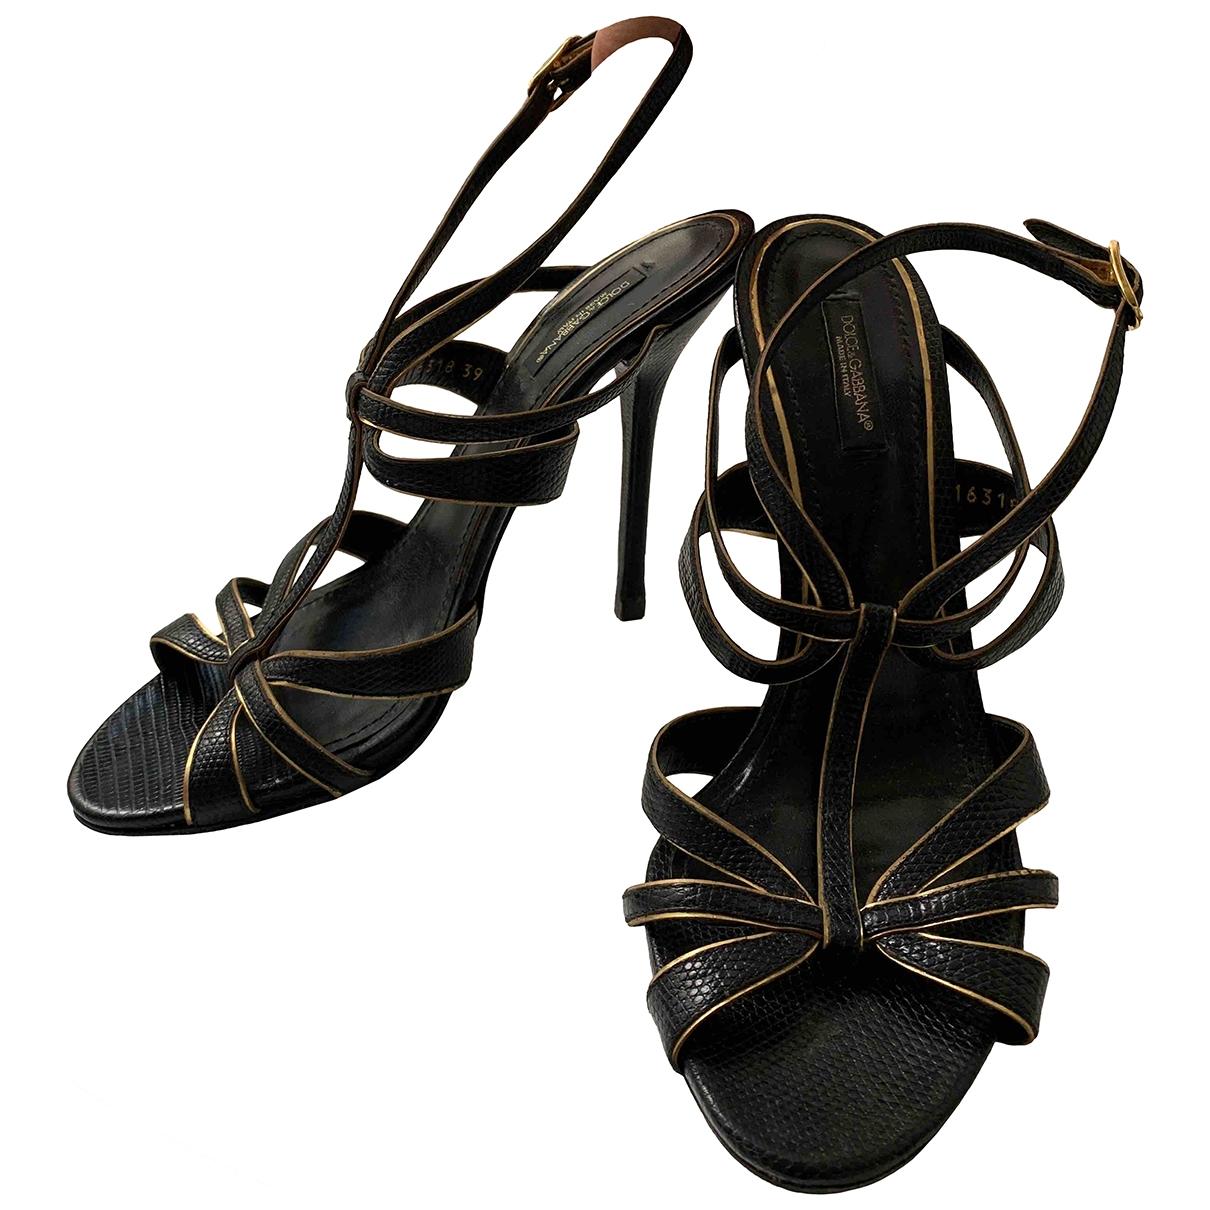 Dolce & Gabbana \N Black Leather Sandals for Women 39 EU